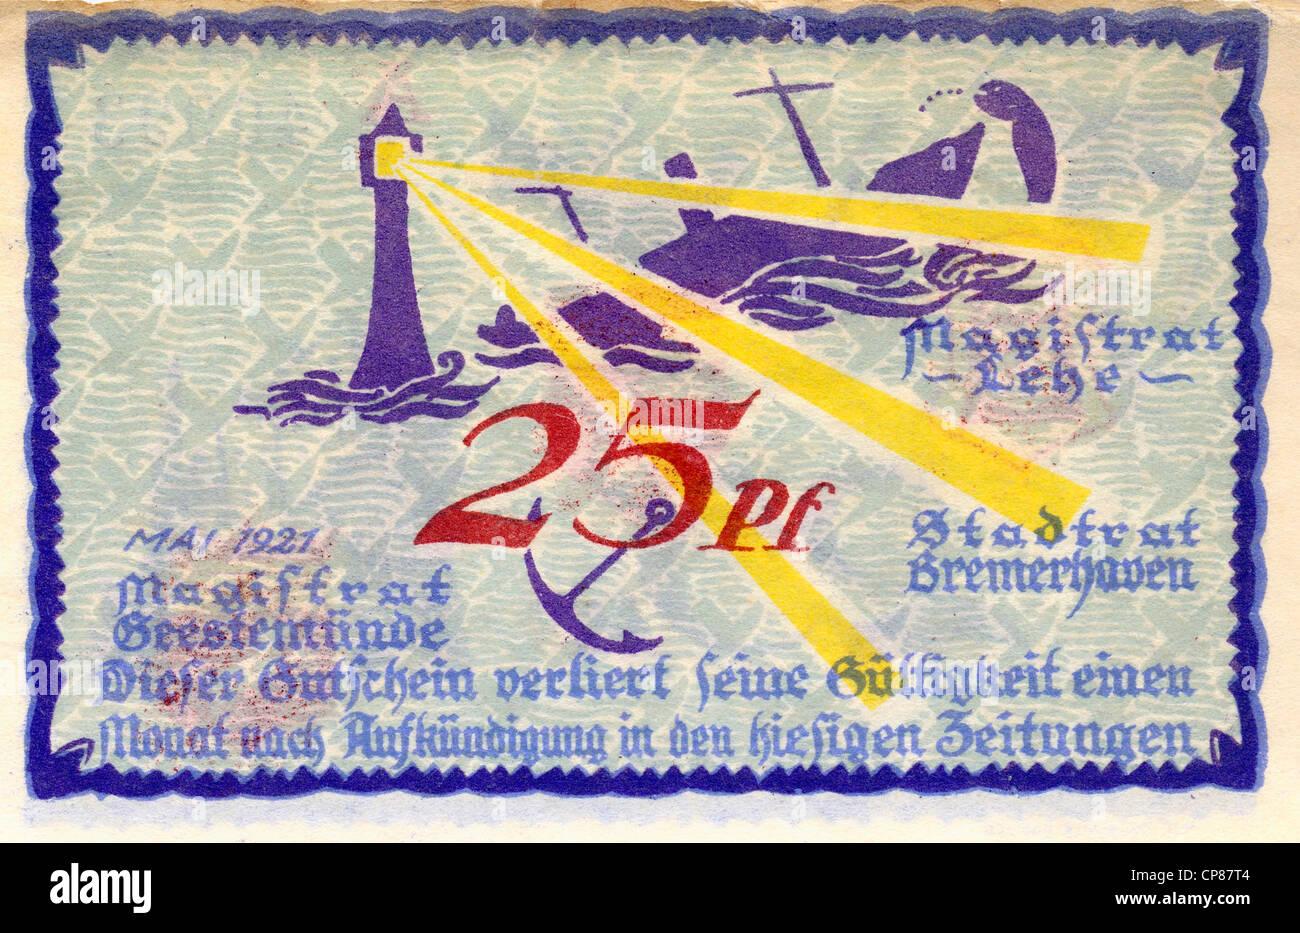 Notgeld aus Bremerhaven, 25 Pfennig, 1921, Deutschland, Europa, moneta di emergenza, la banconota, Germania, Europa Immagini Stock